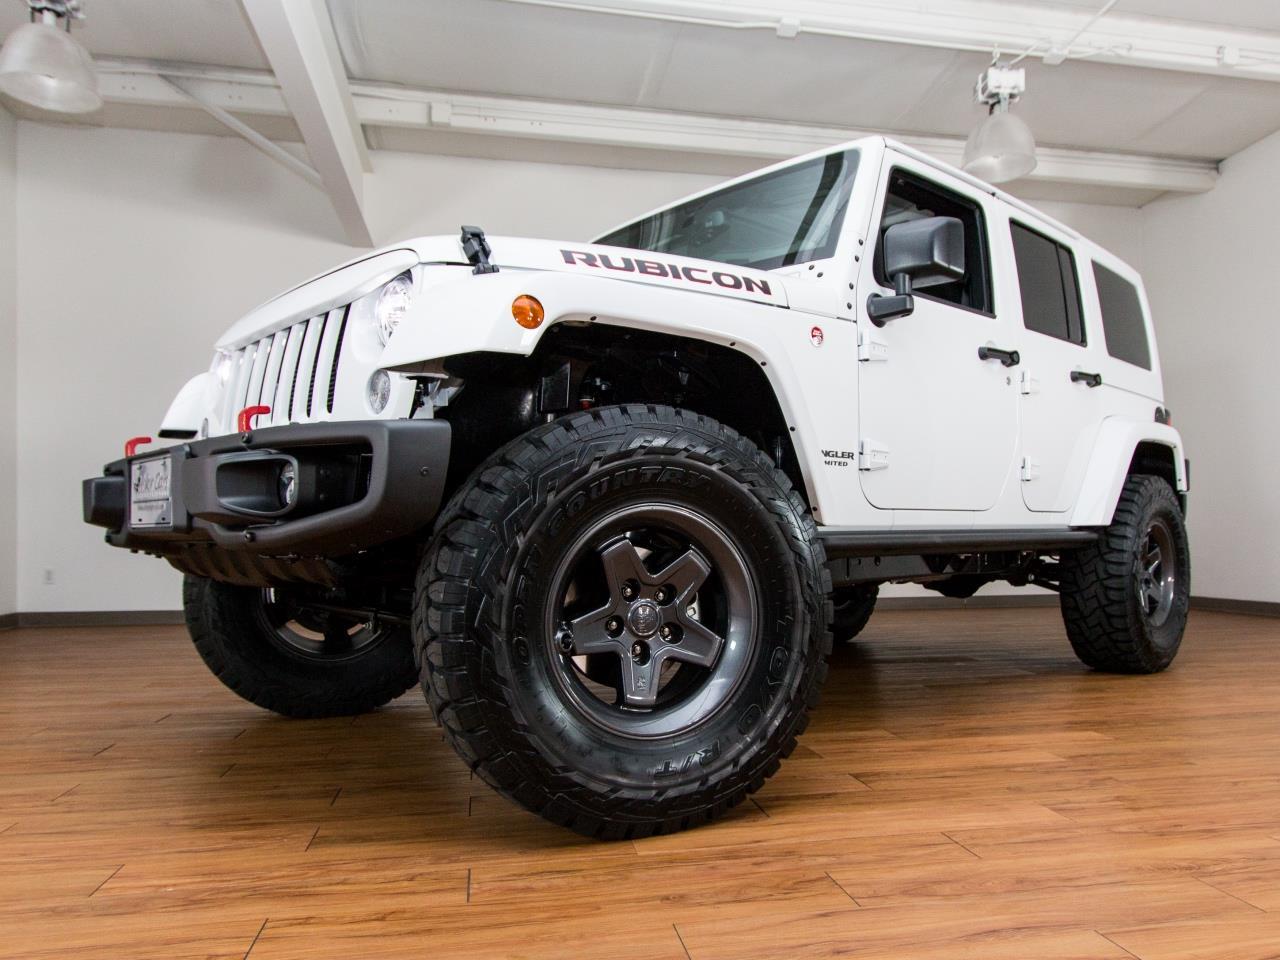 2017 Jeep Wrangler Unlimited Rubicon 4X4 Hard Rock